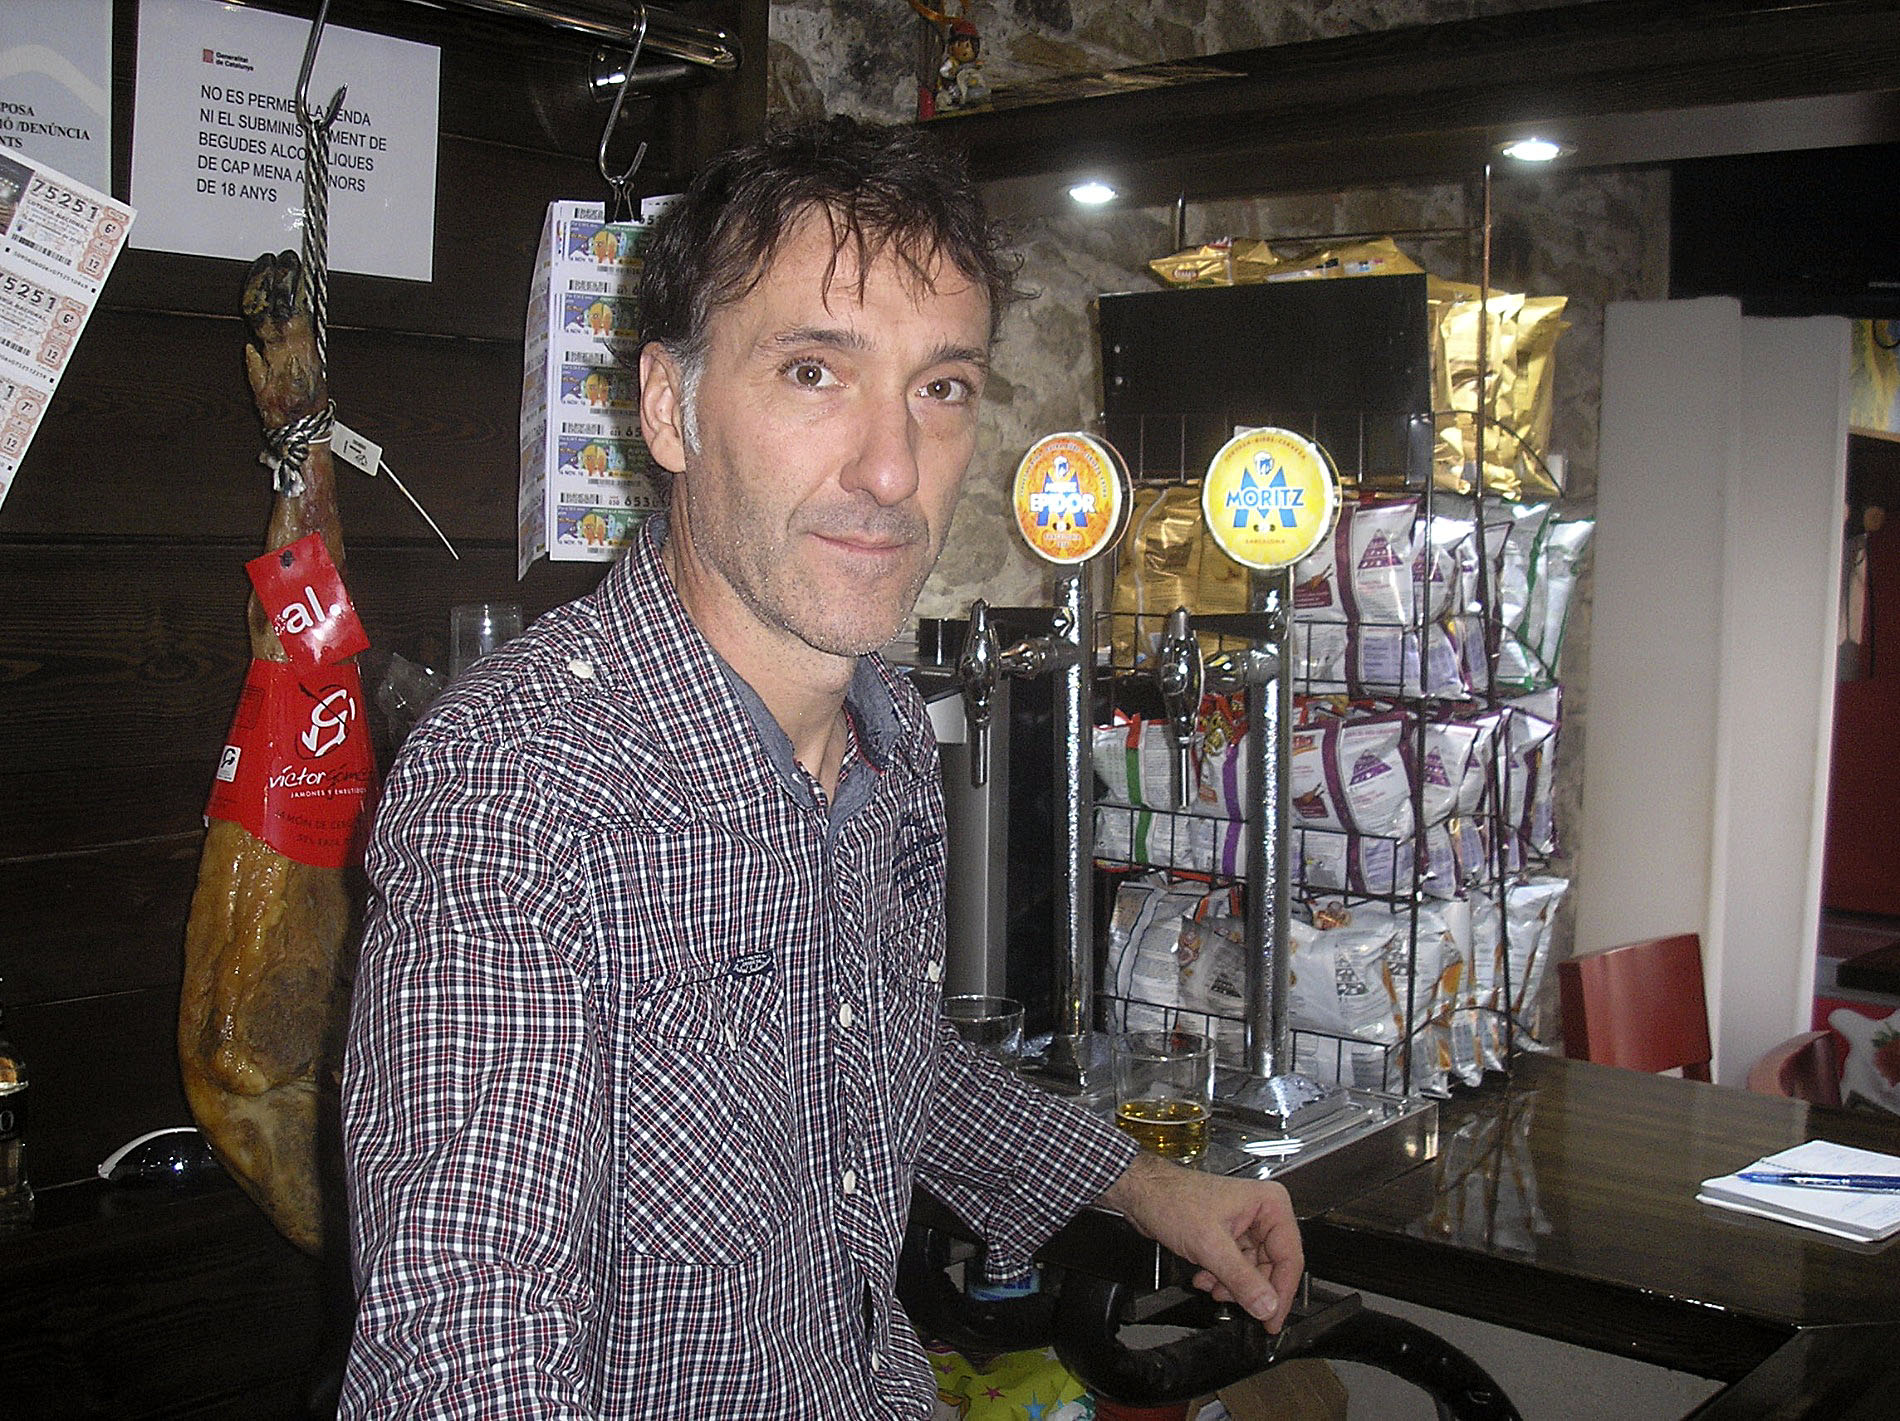 Jordi Remolins